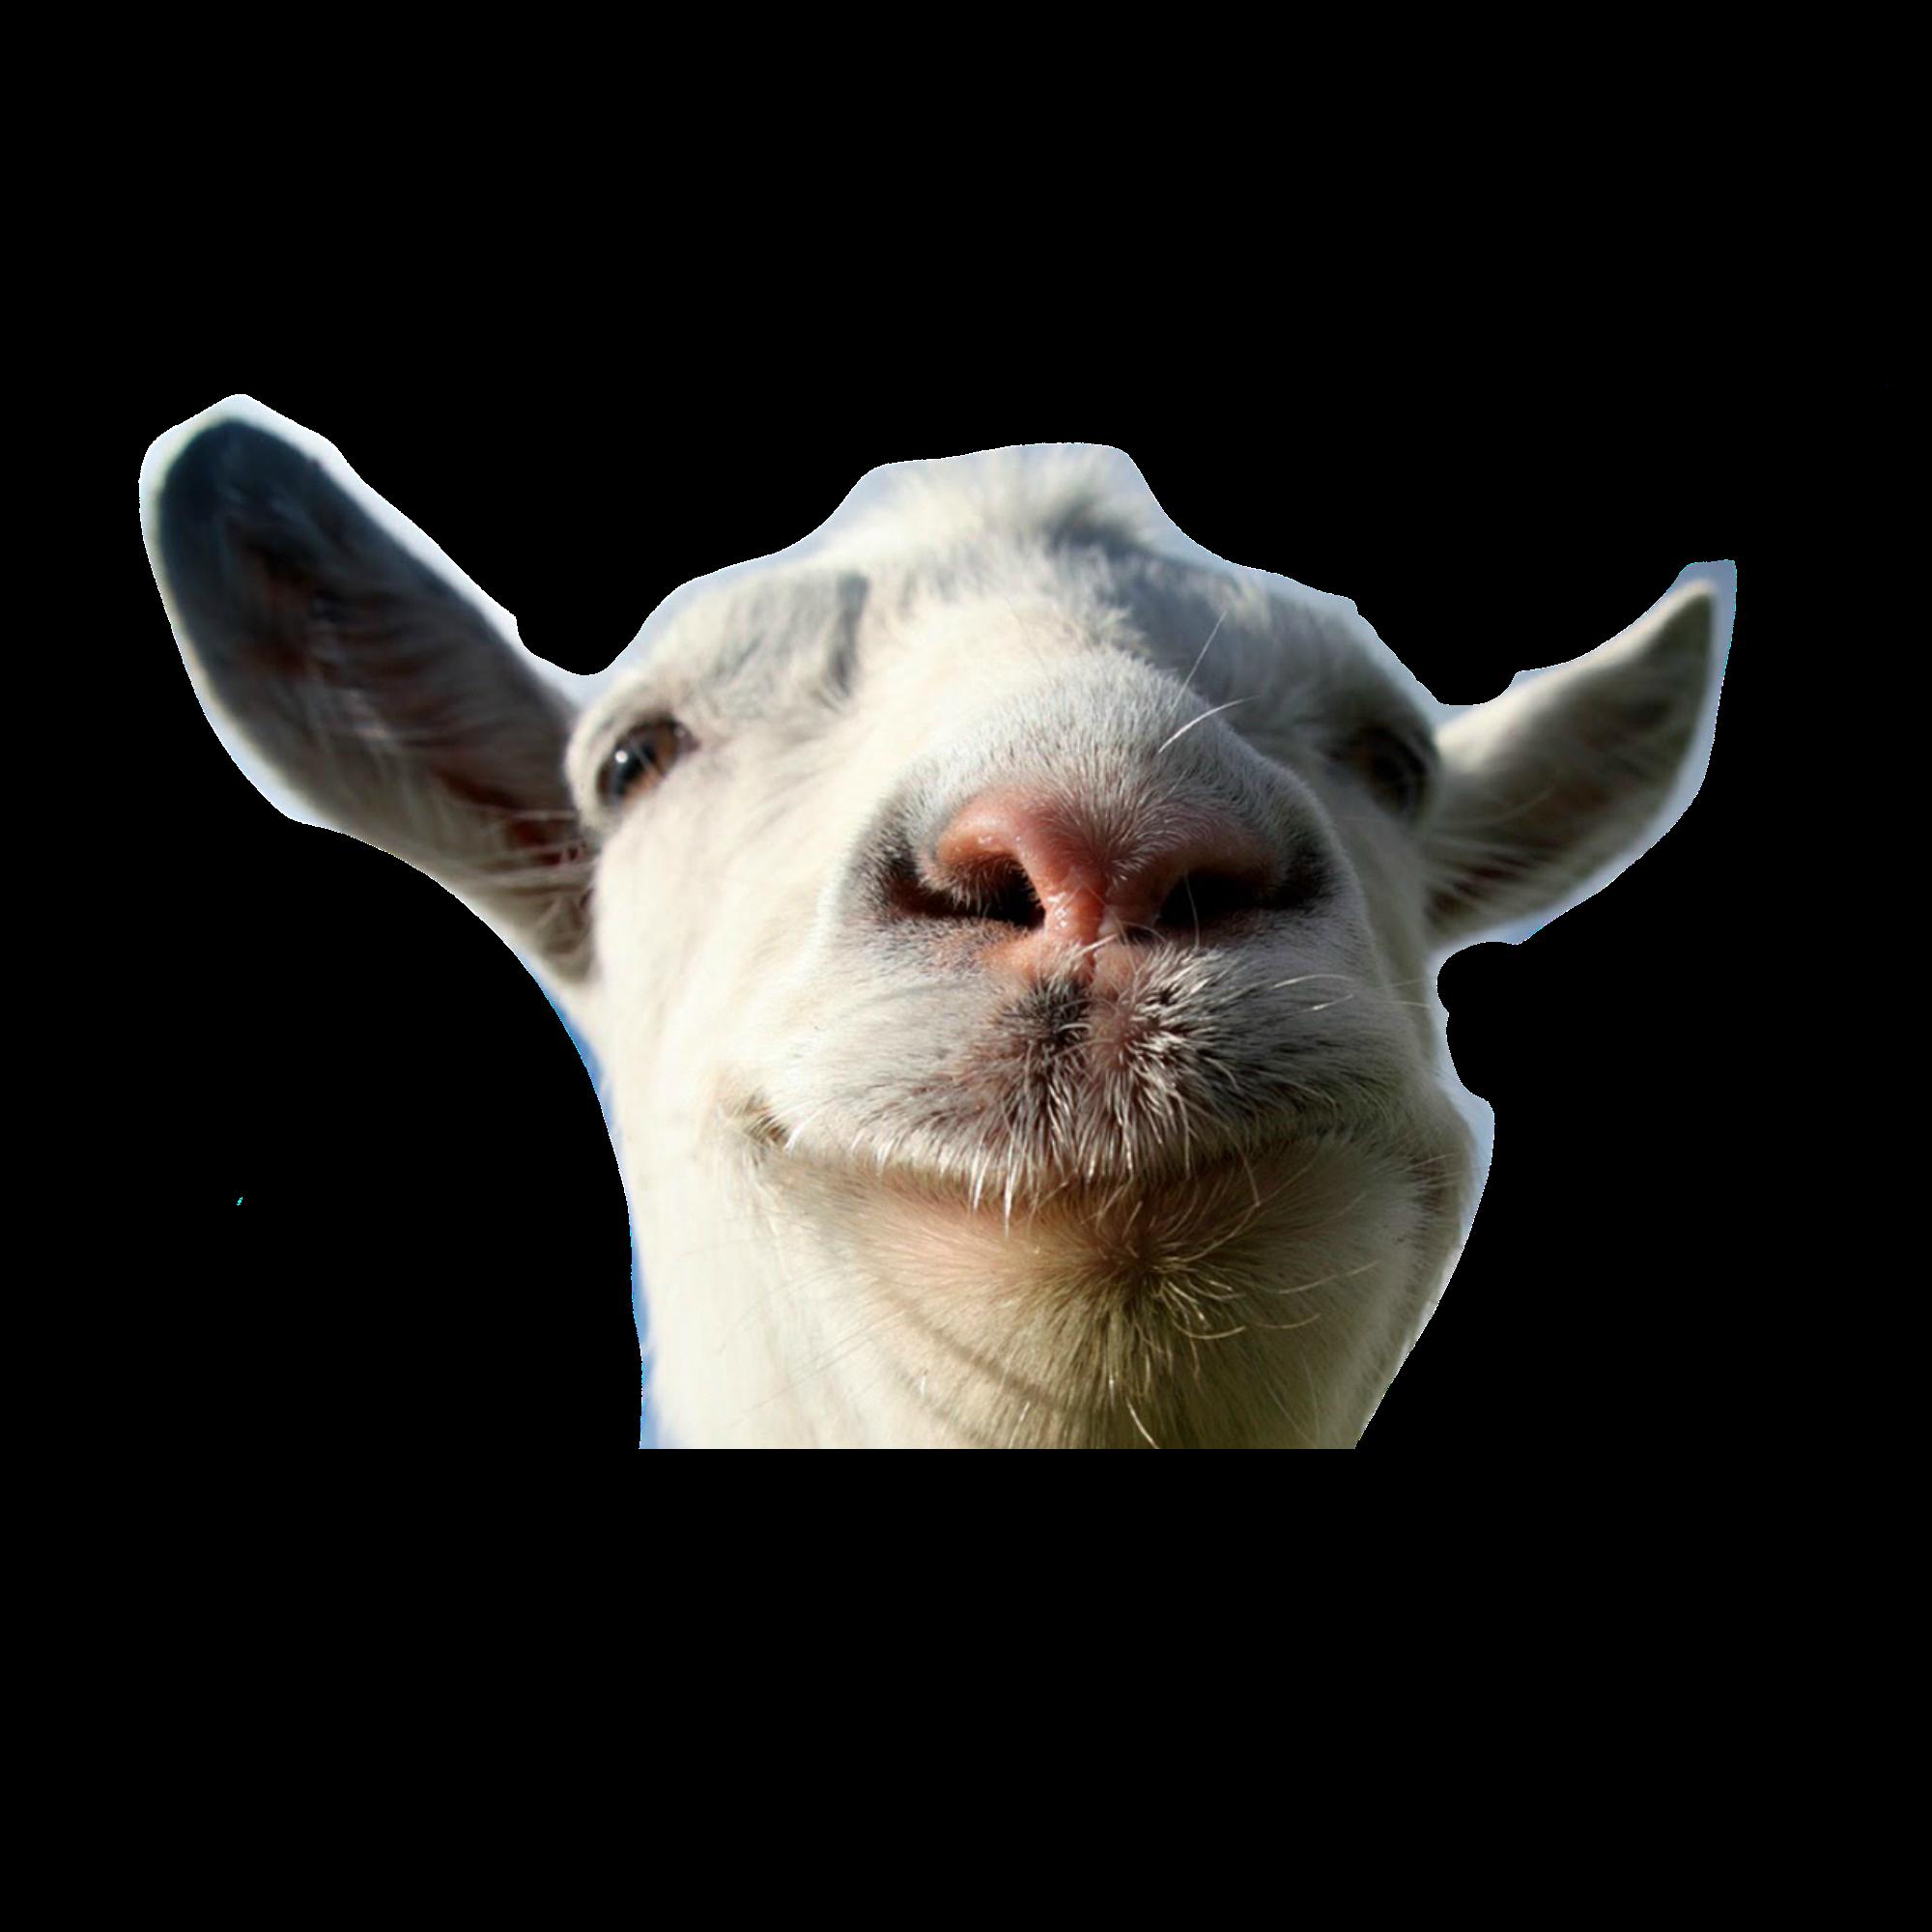 Goat PNG - 15765